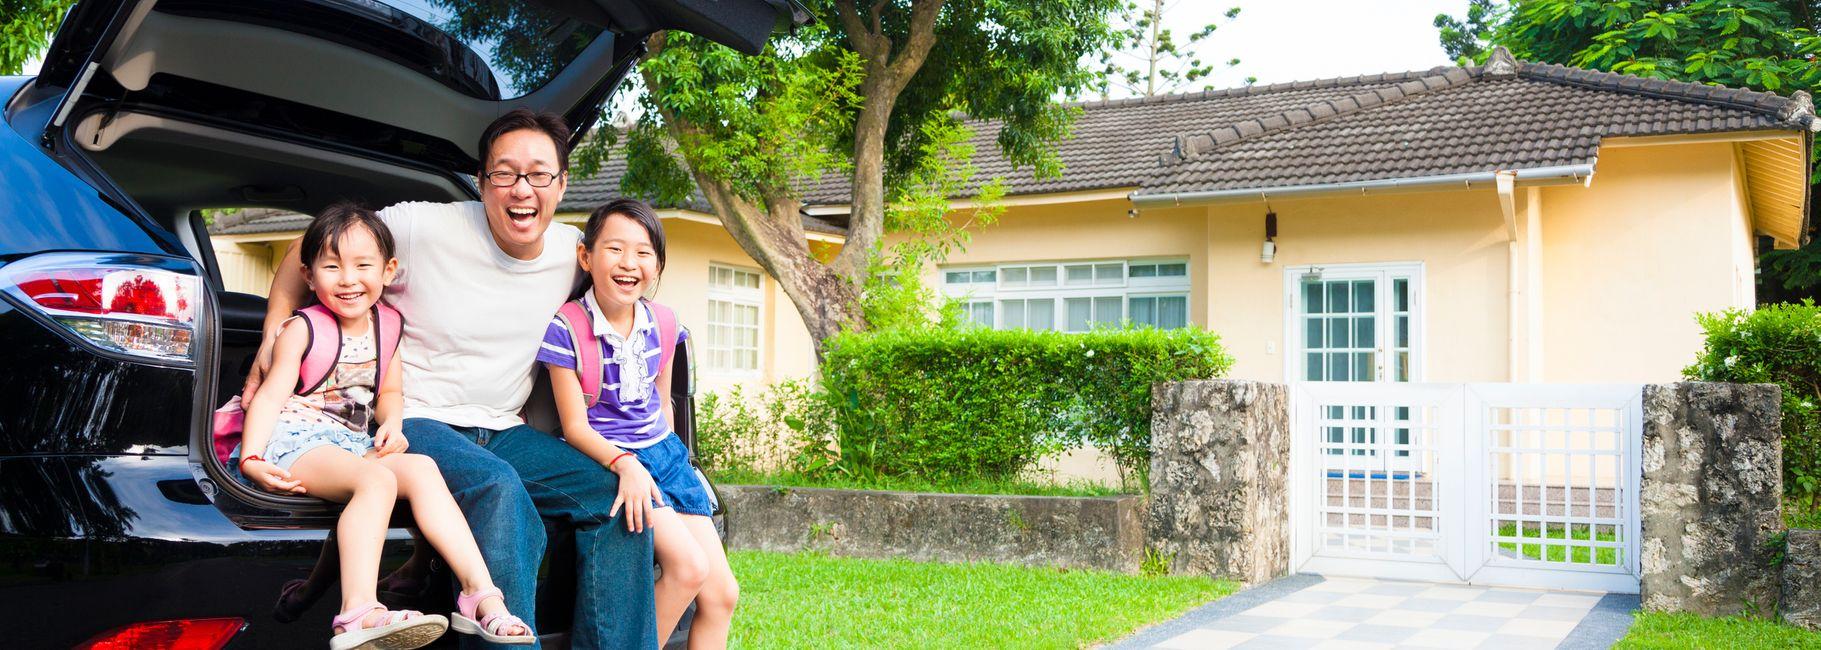 Happy family that refinanced auto loan